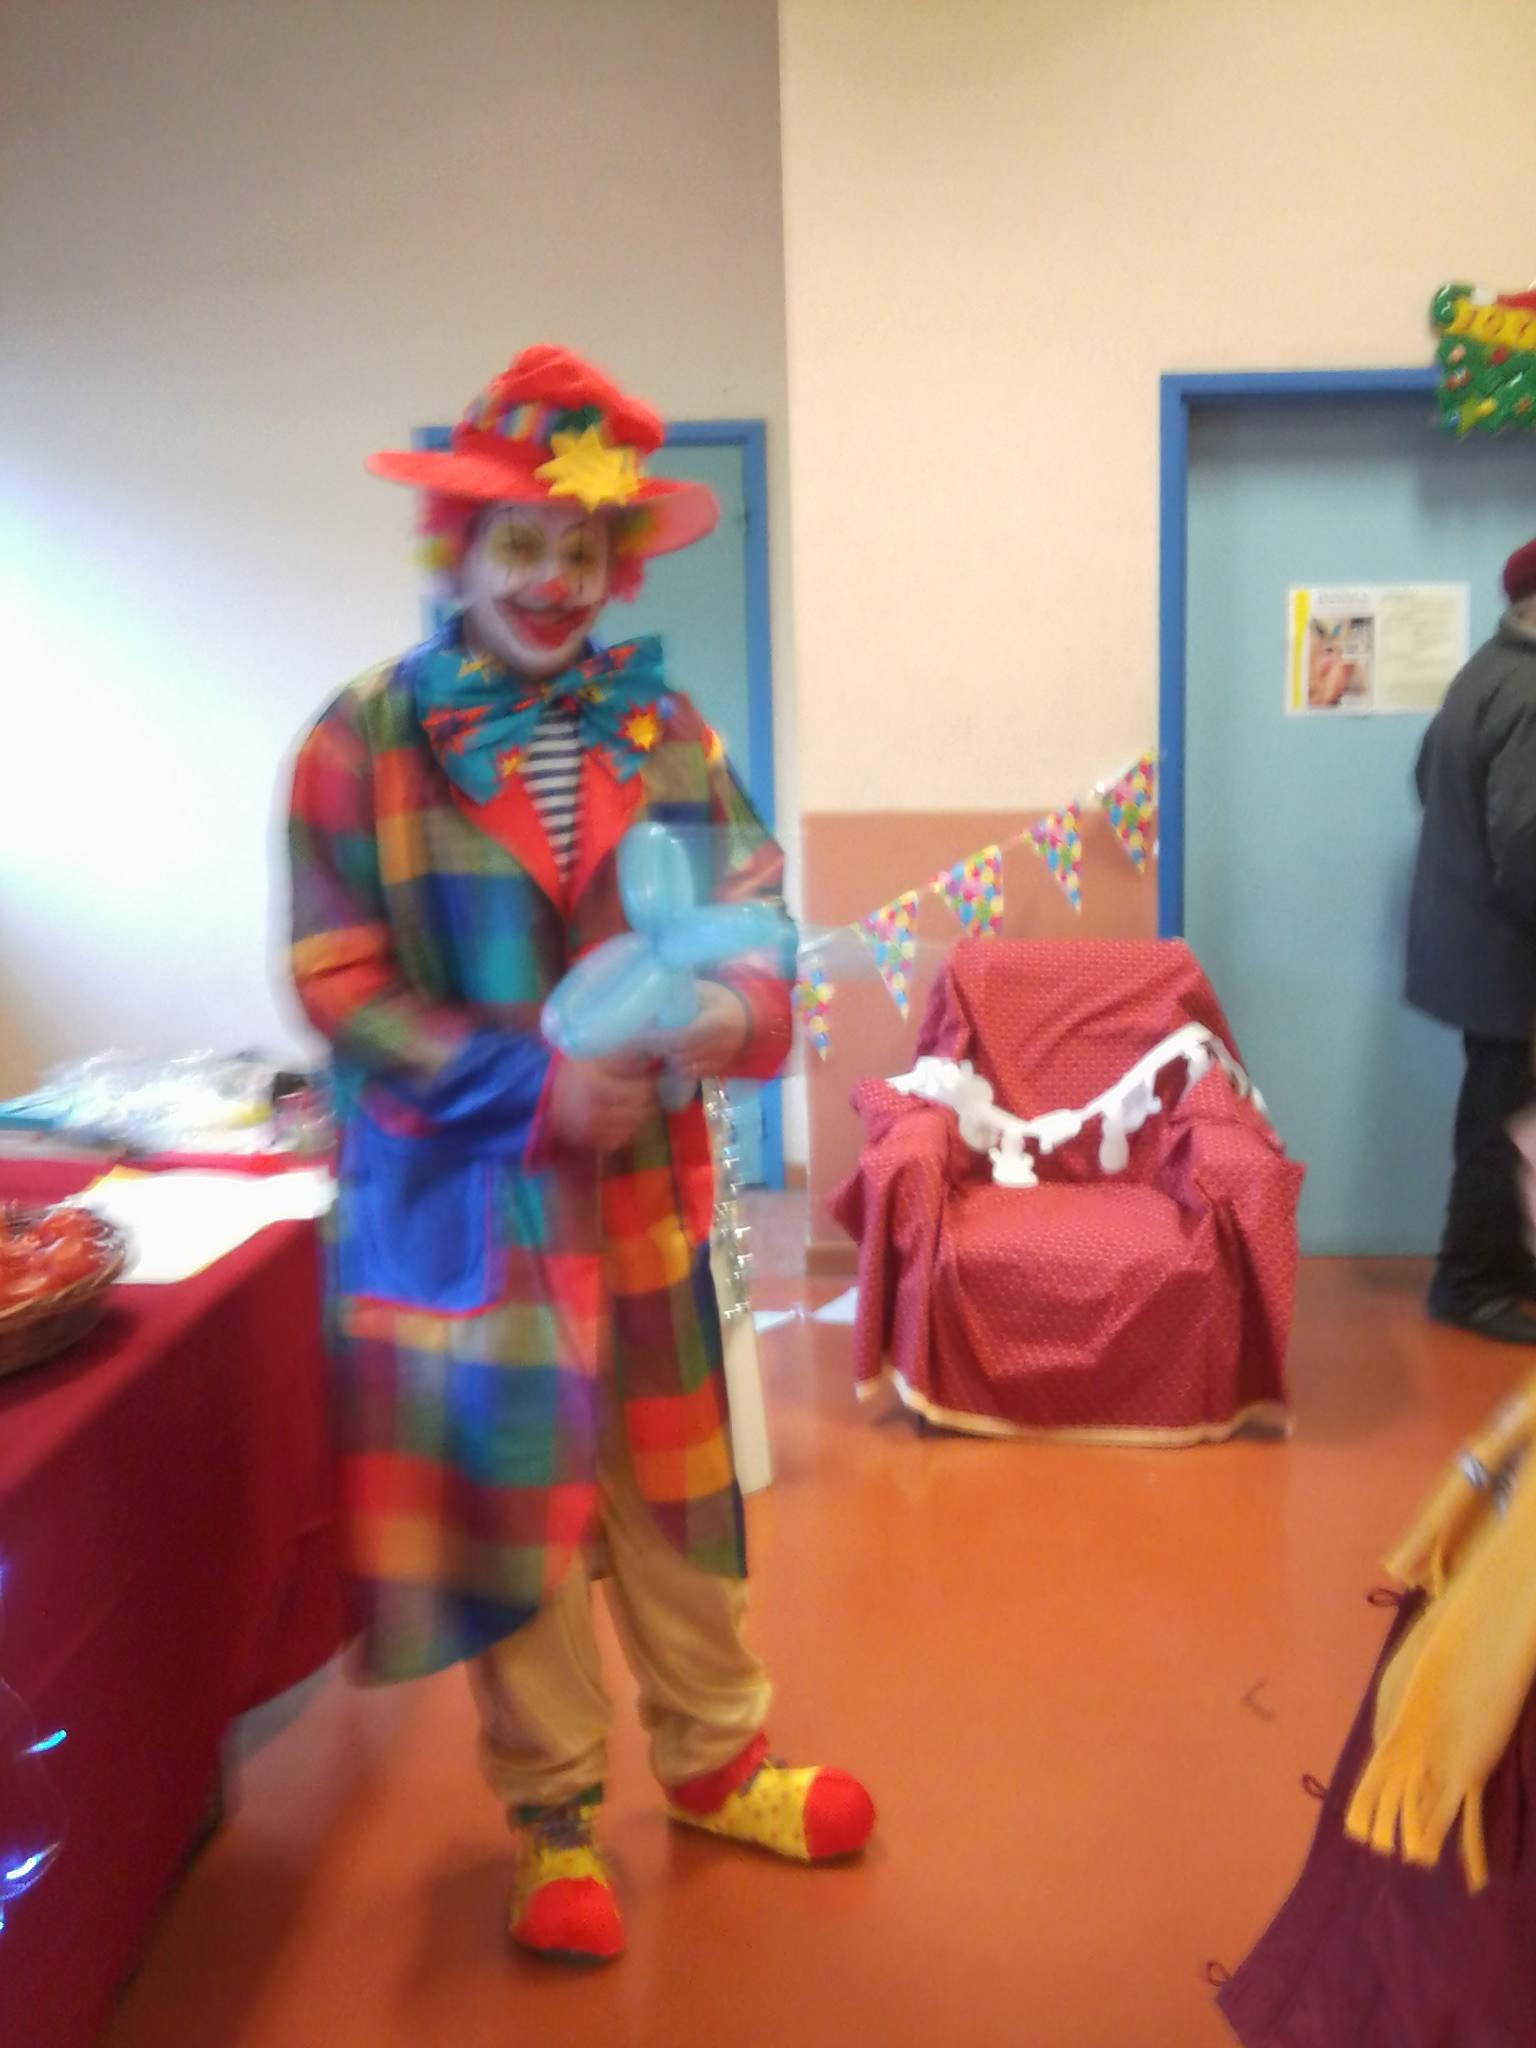 Dyno le Clown Marché de Nöel Labastide rourairoux Tarn